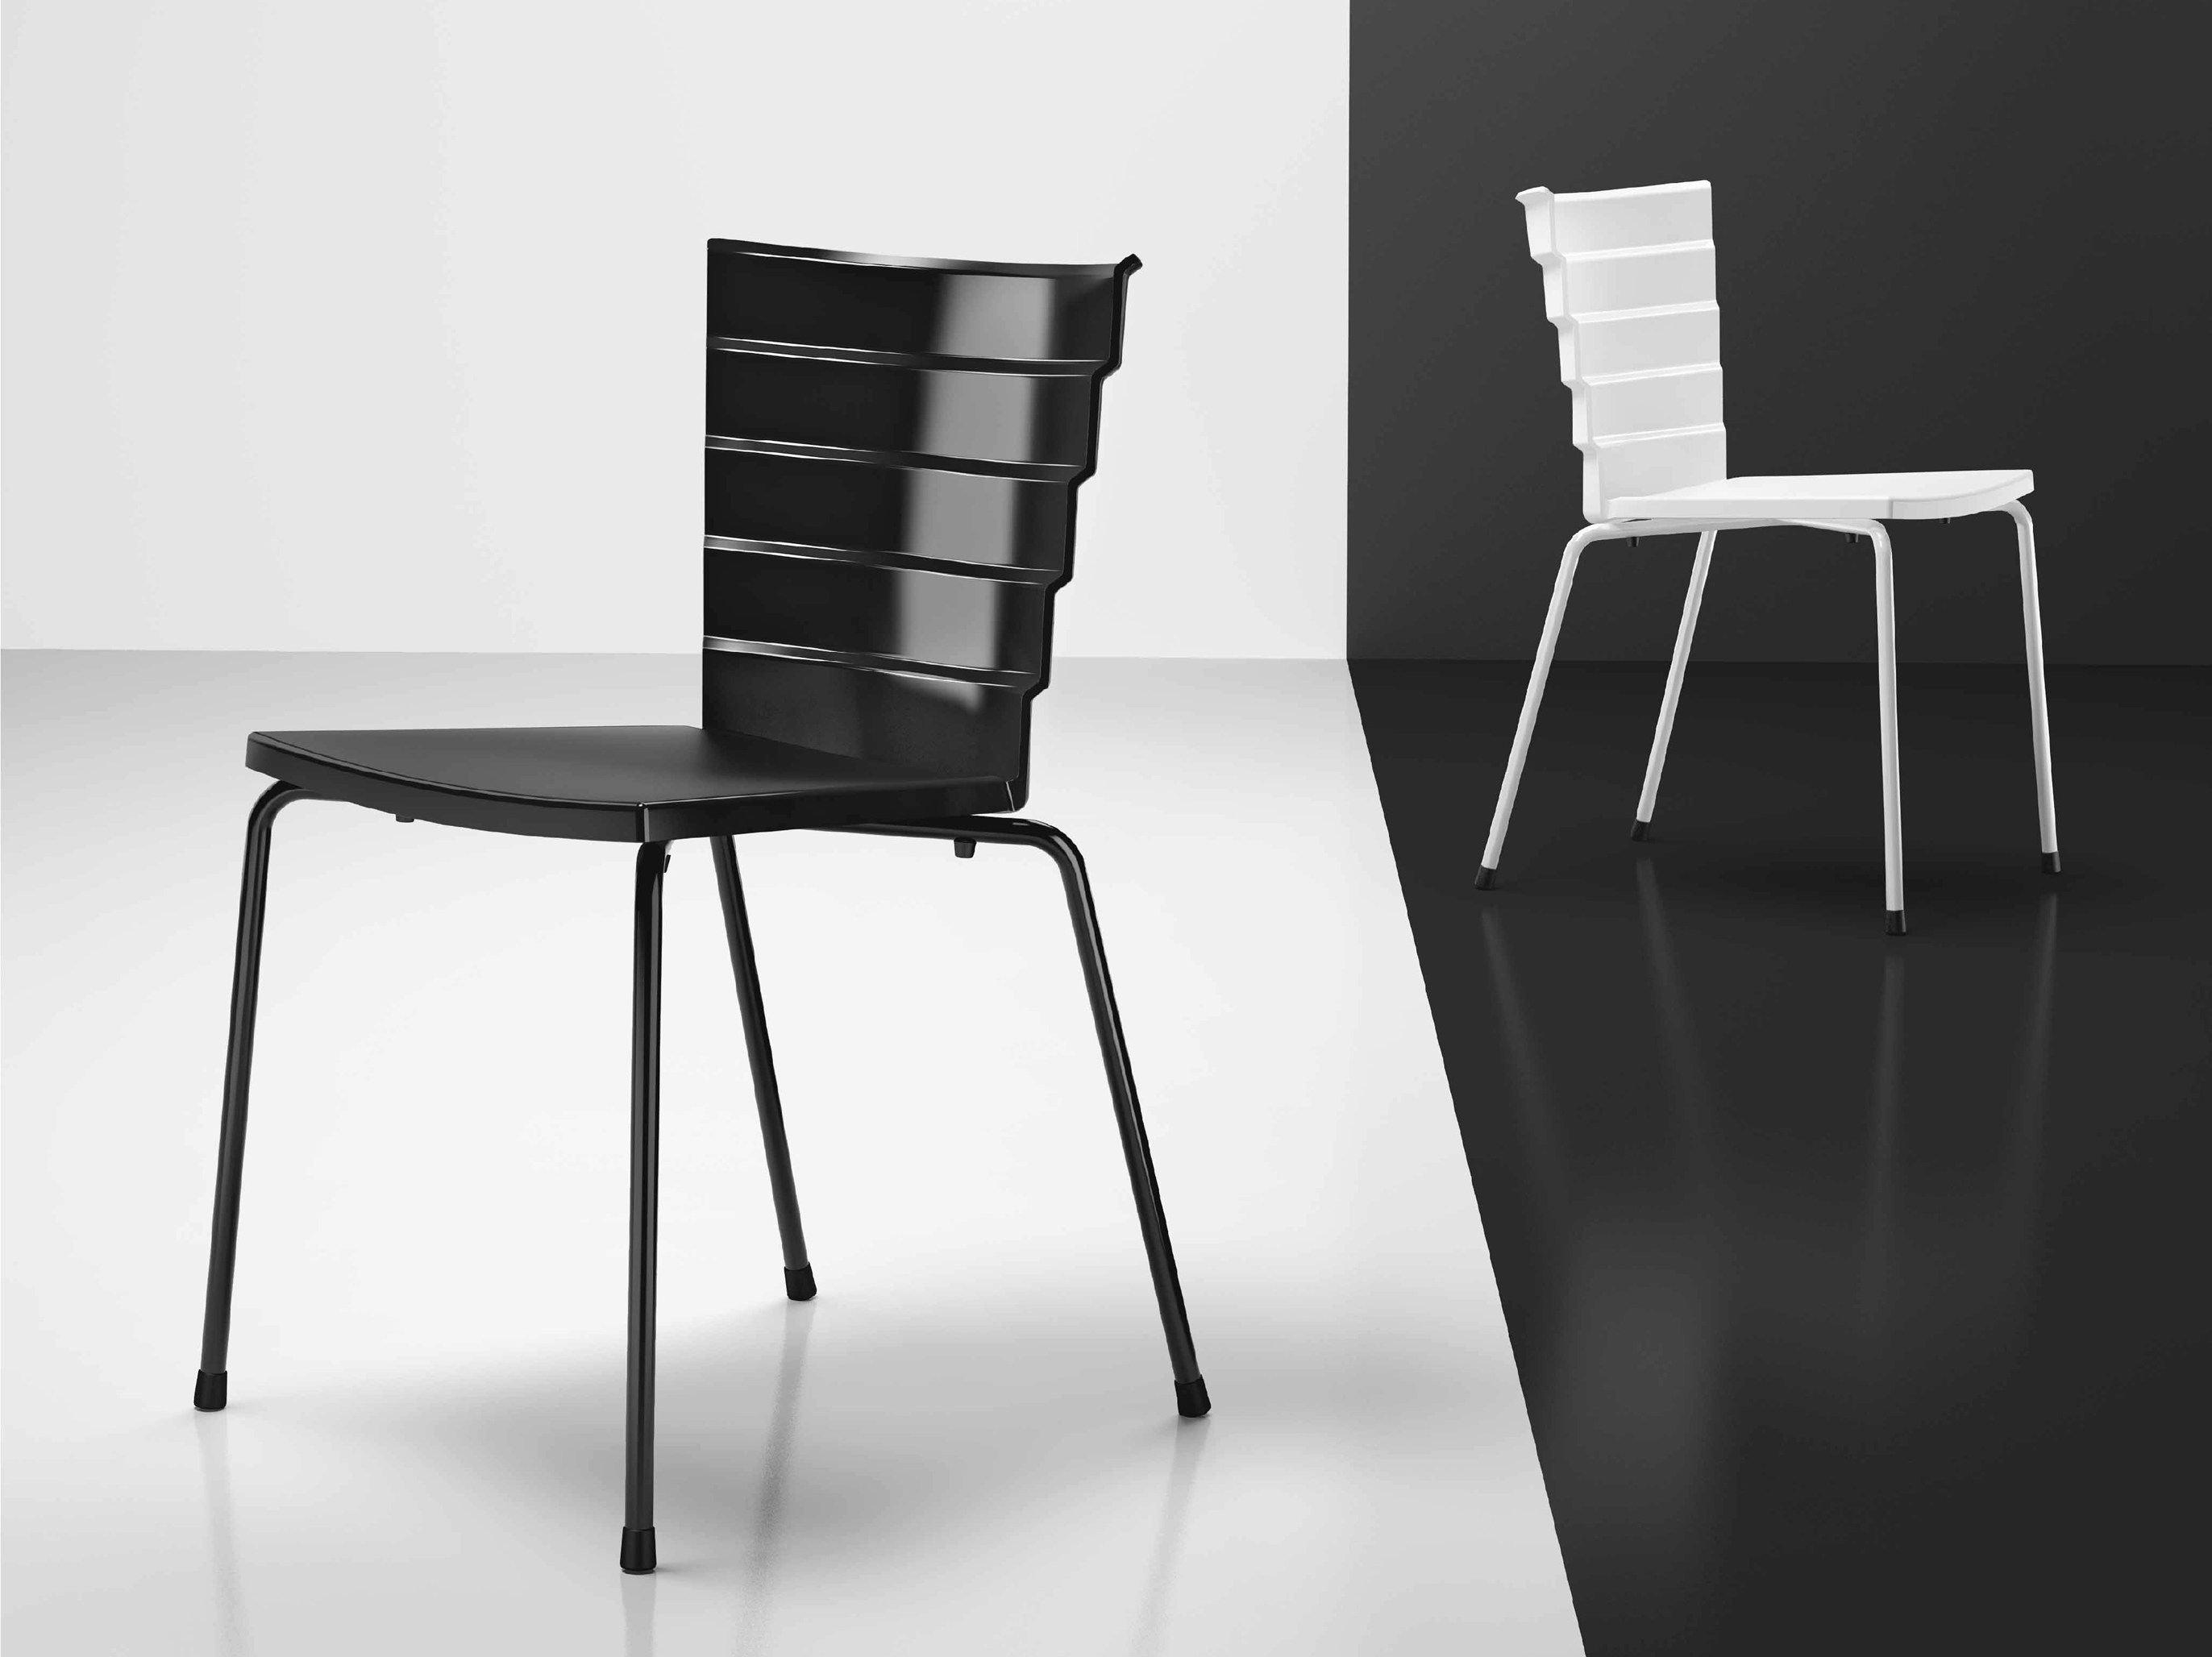 Marvelous Bikini Dining Chairs By Marc Sadler For Metalmobil